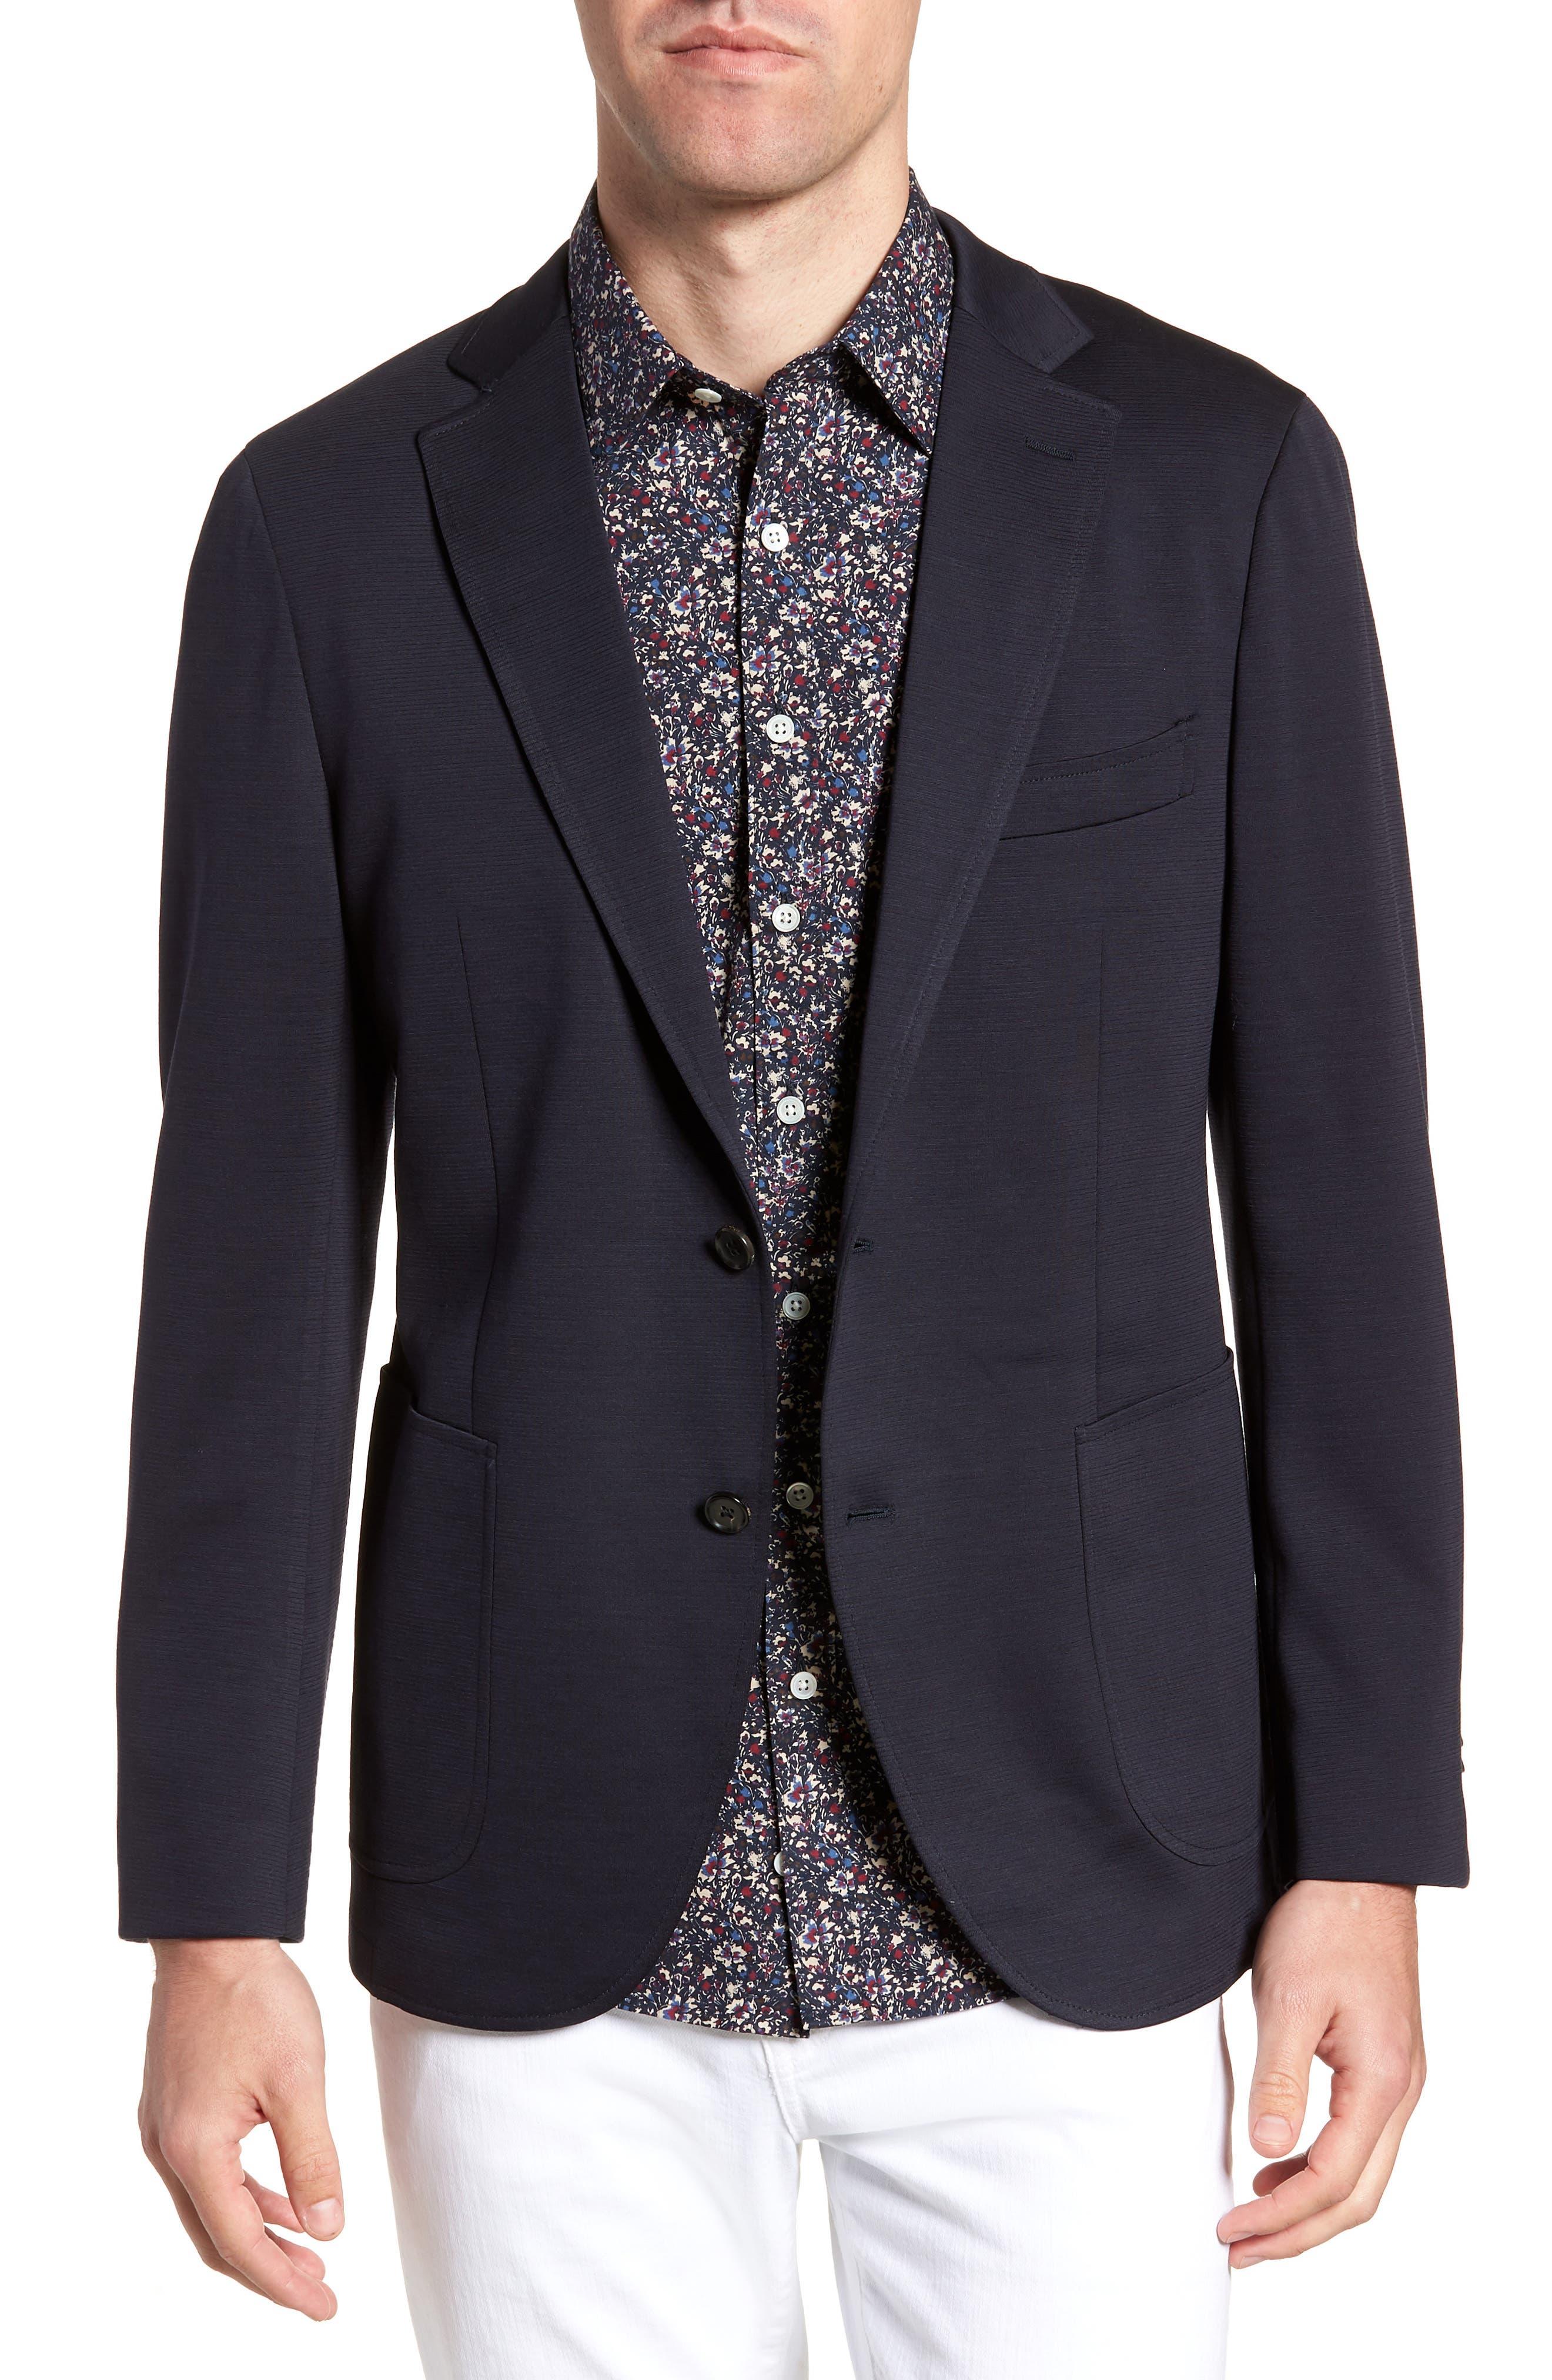 Cardrona Slim Fit Wool Blend Blazer,                             Main thumbnail 1, color,                             460